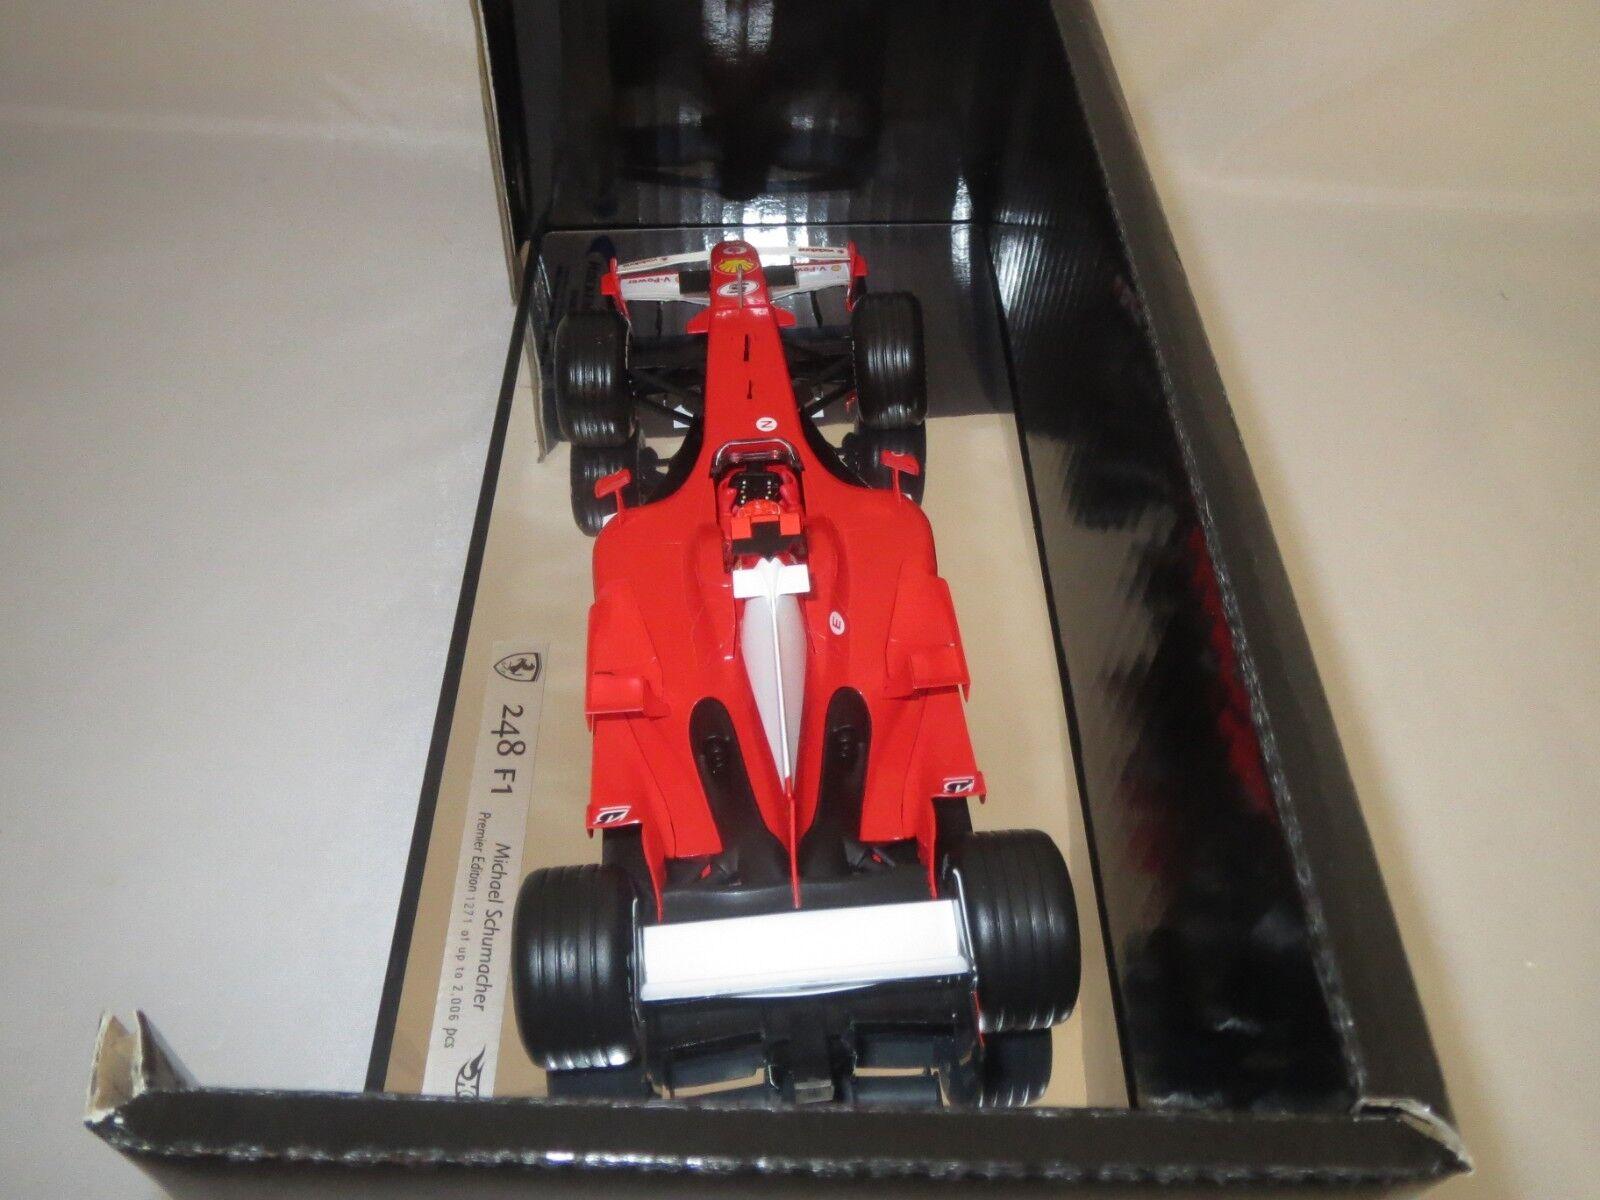 Mattel Mattel Mattel j2987 (M. Schumacher #5) 248 f1